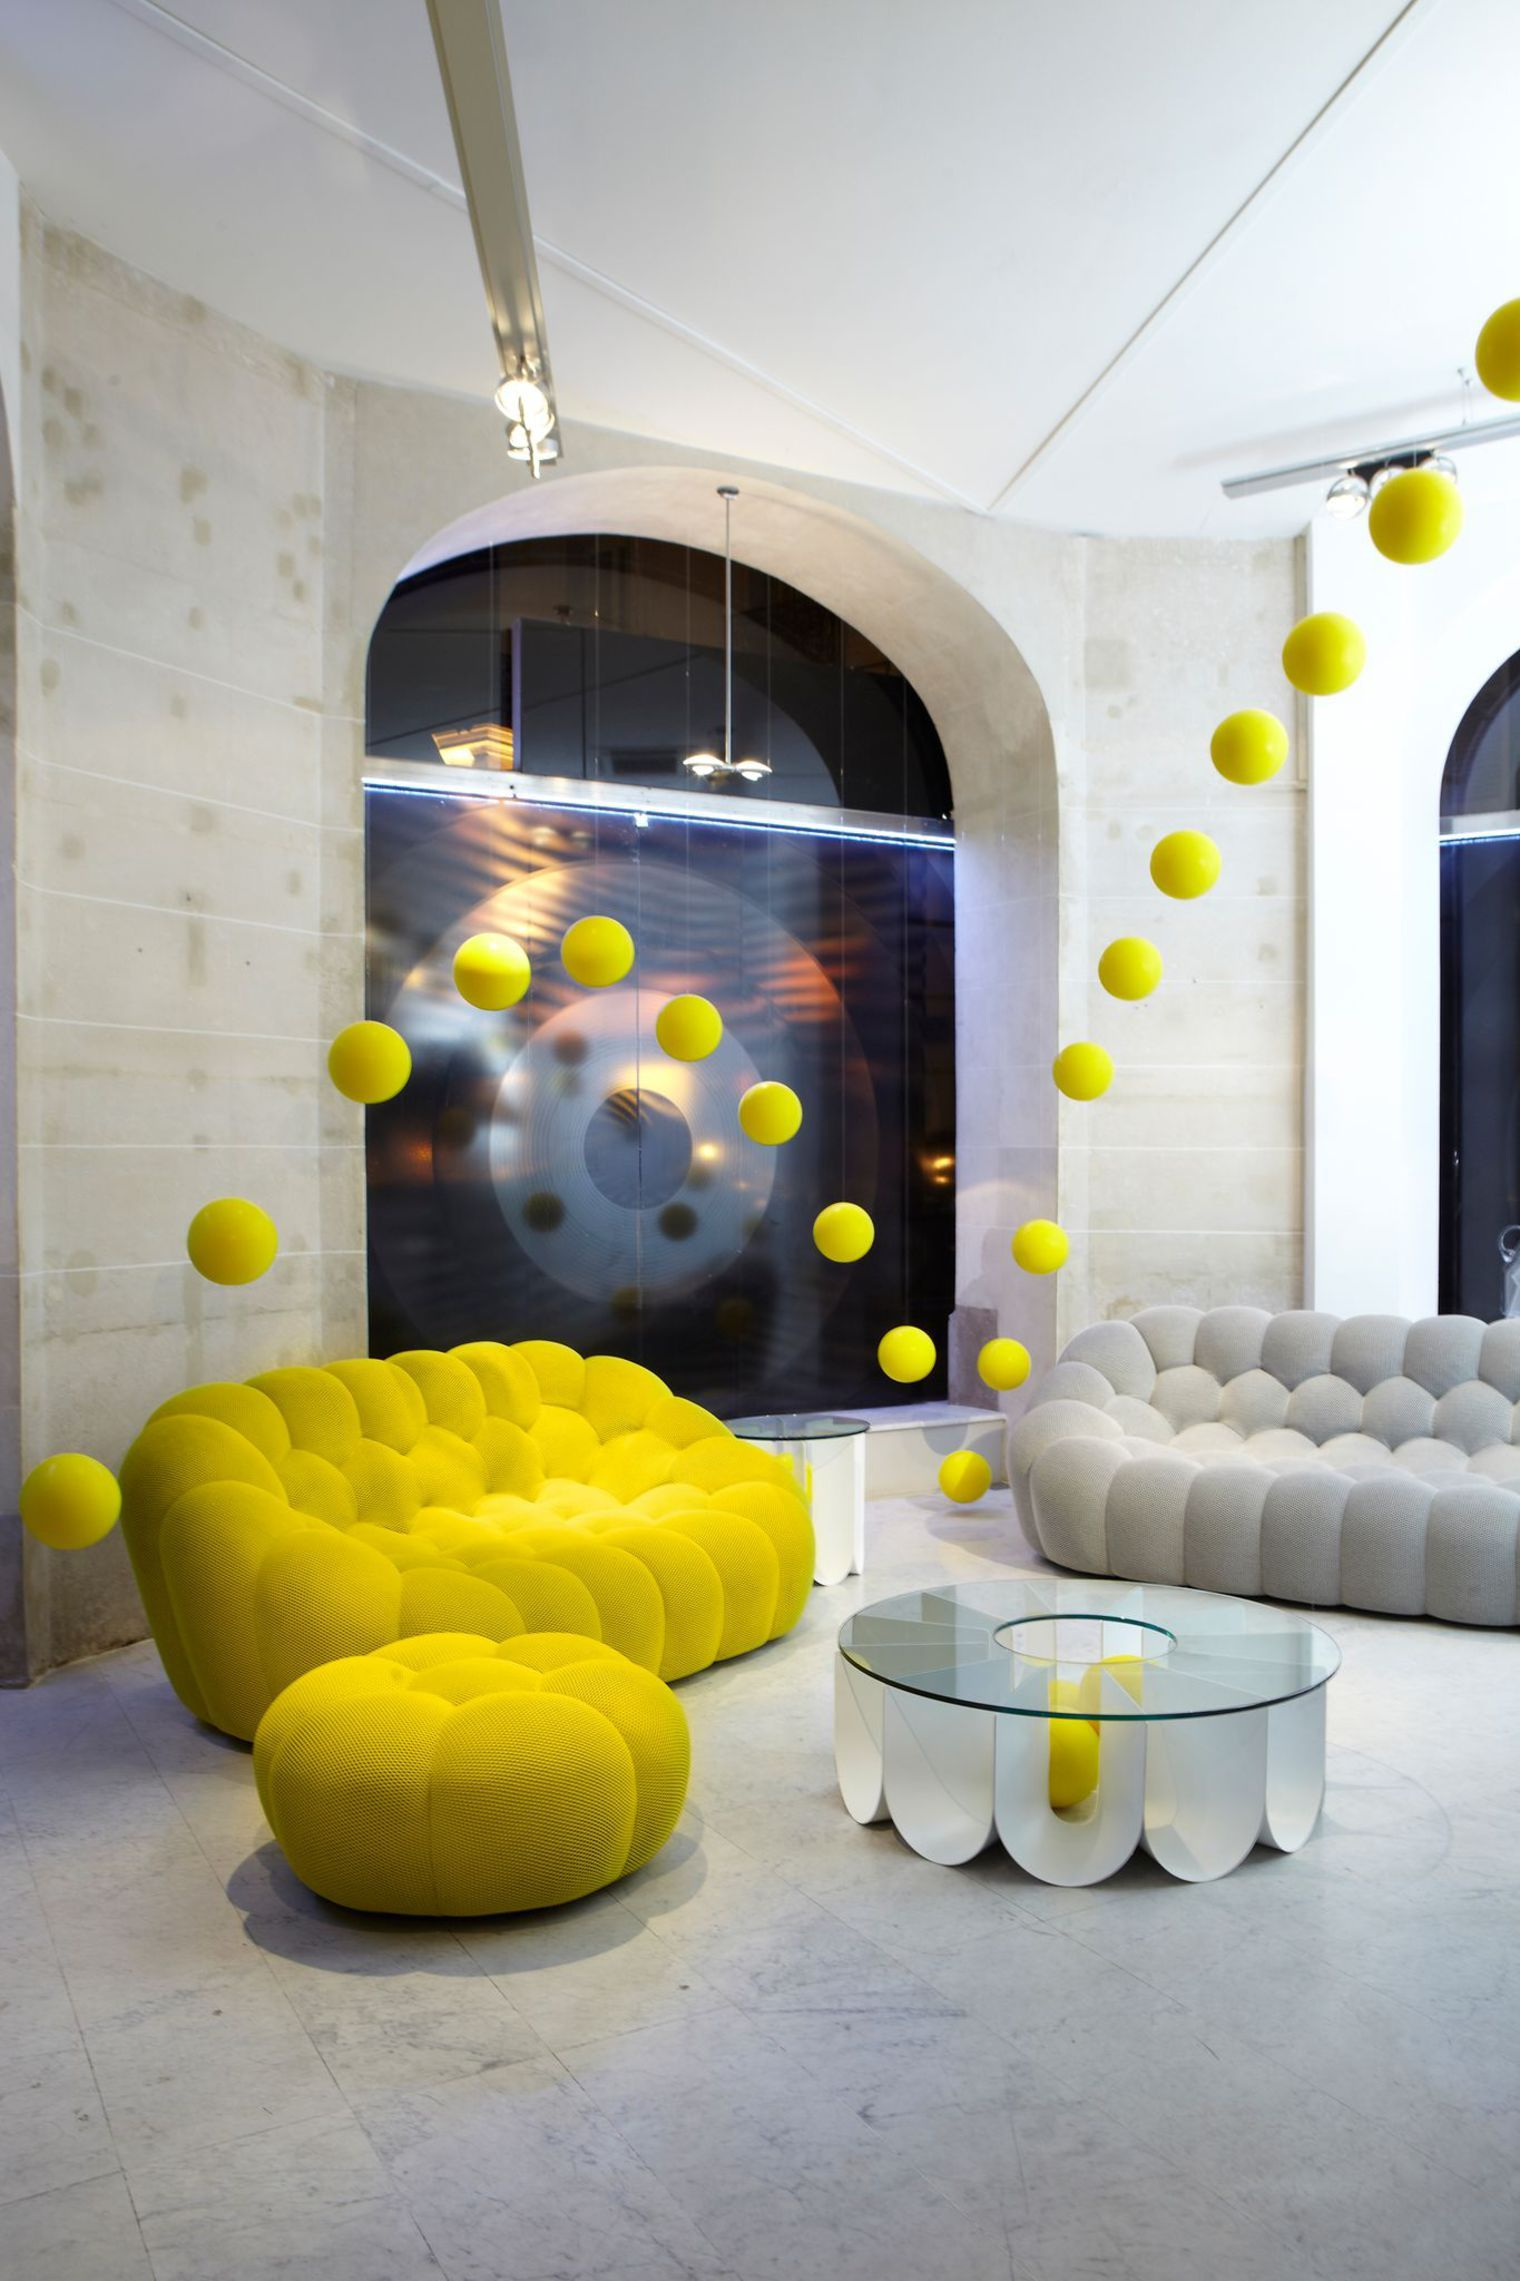 Bubble Sofa Roche Bobois bubble sofa - roche bobois   perfect living room decor